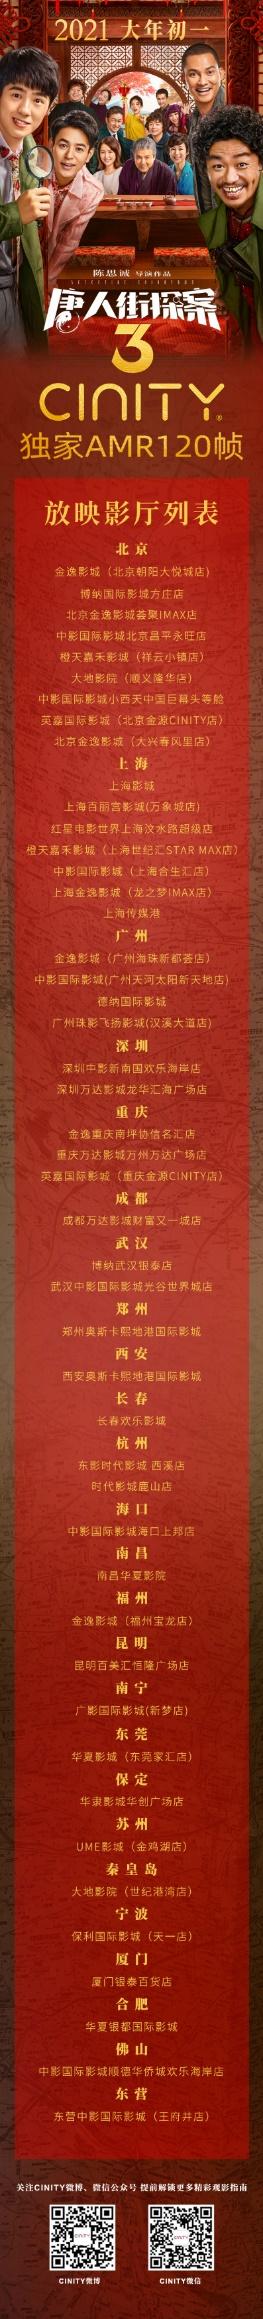 CINITY独家AMR 120帧《唐人街探案3》将于2021大年初一全国上映